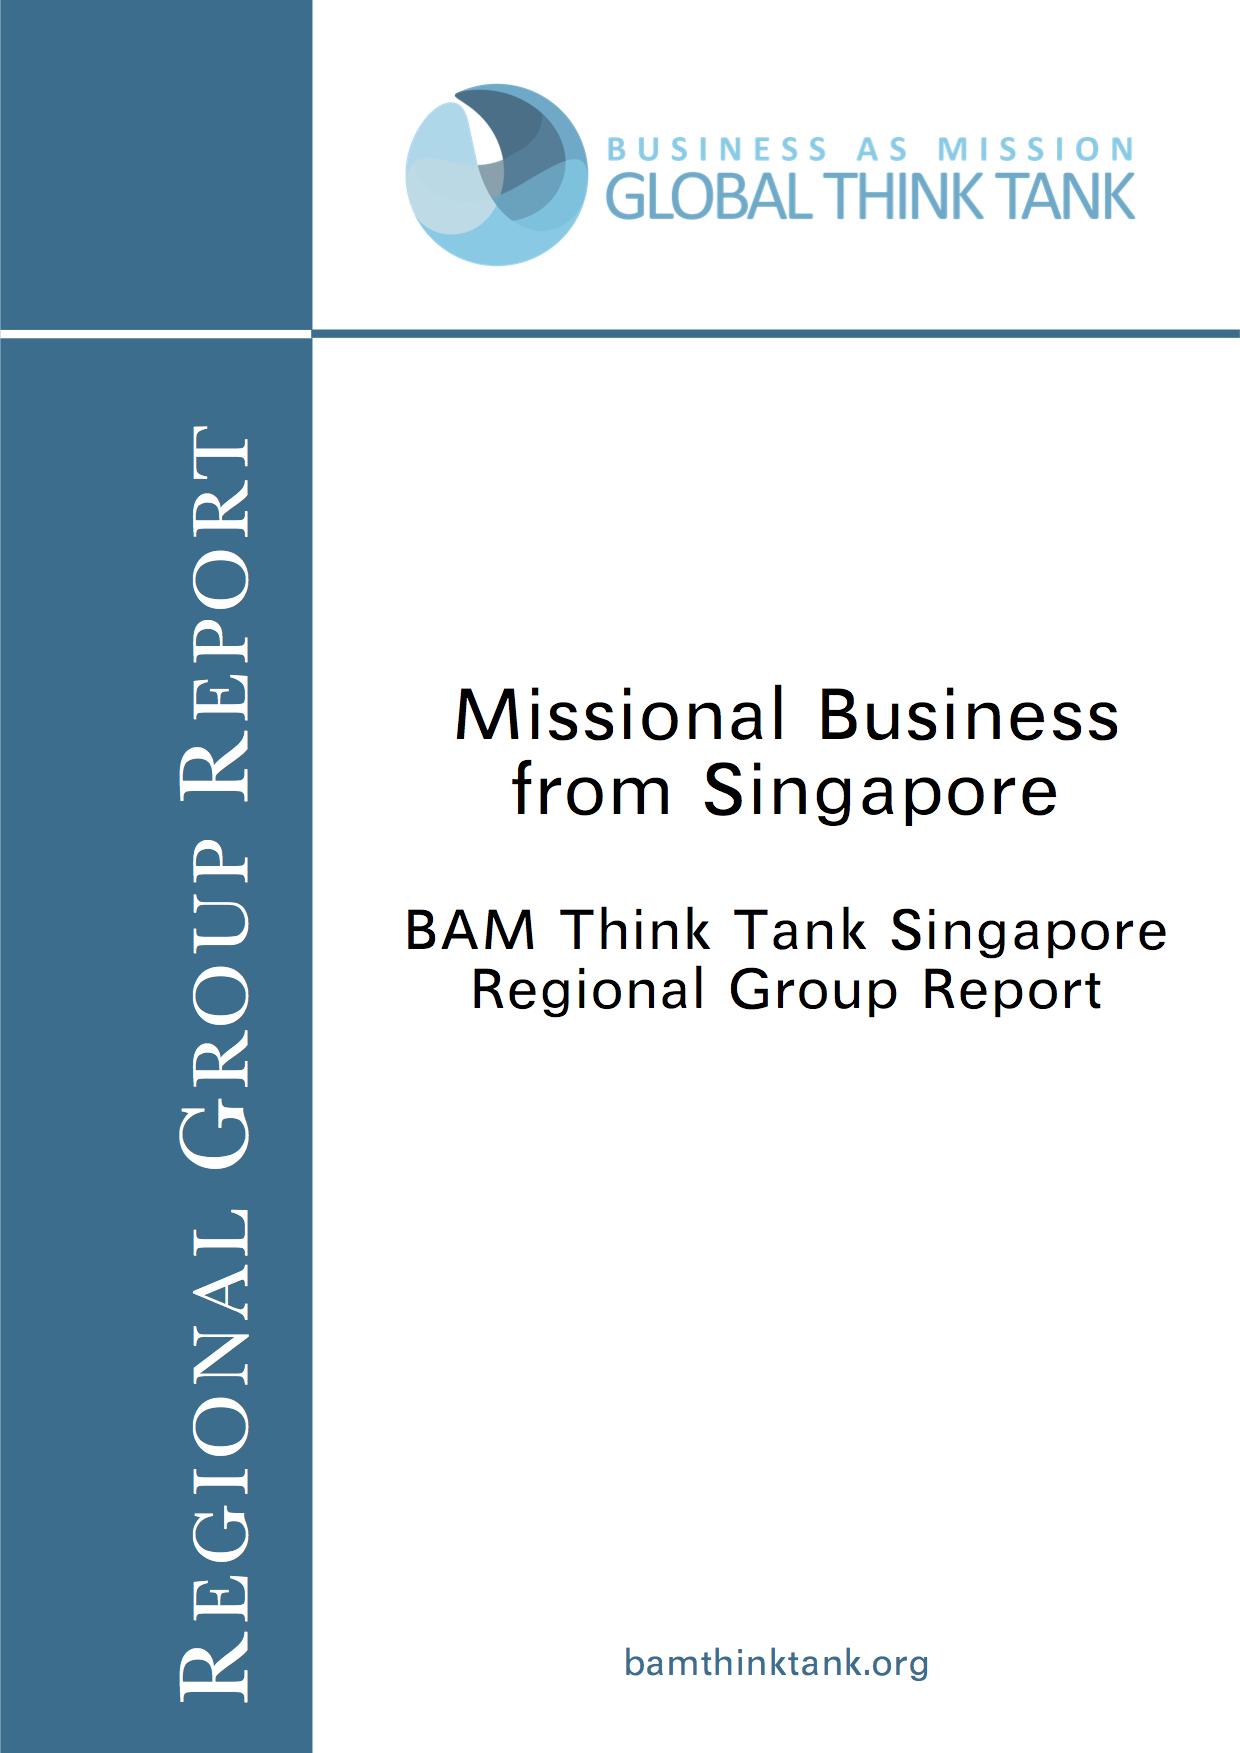 BAM Think Tank Report: Singapore